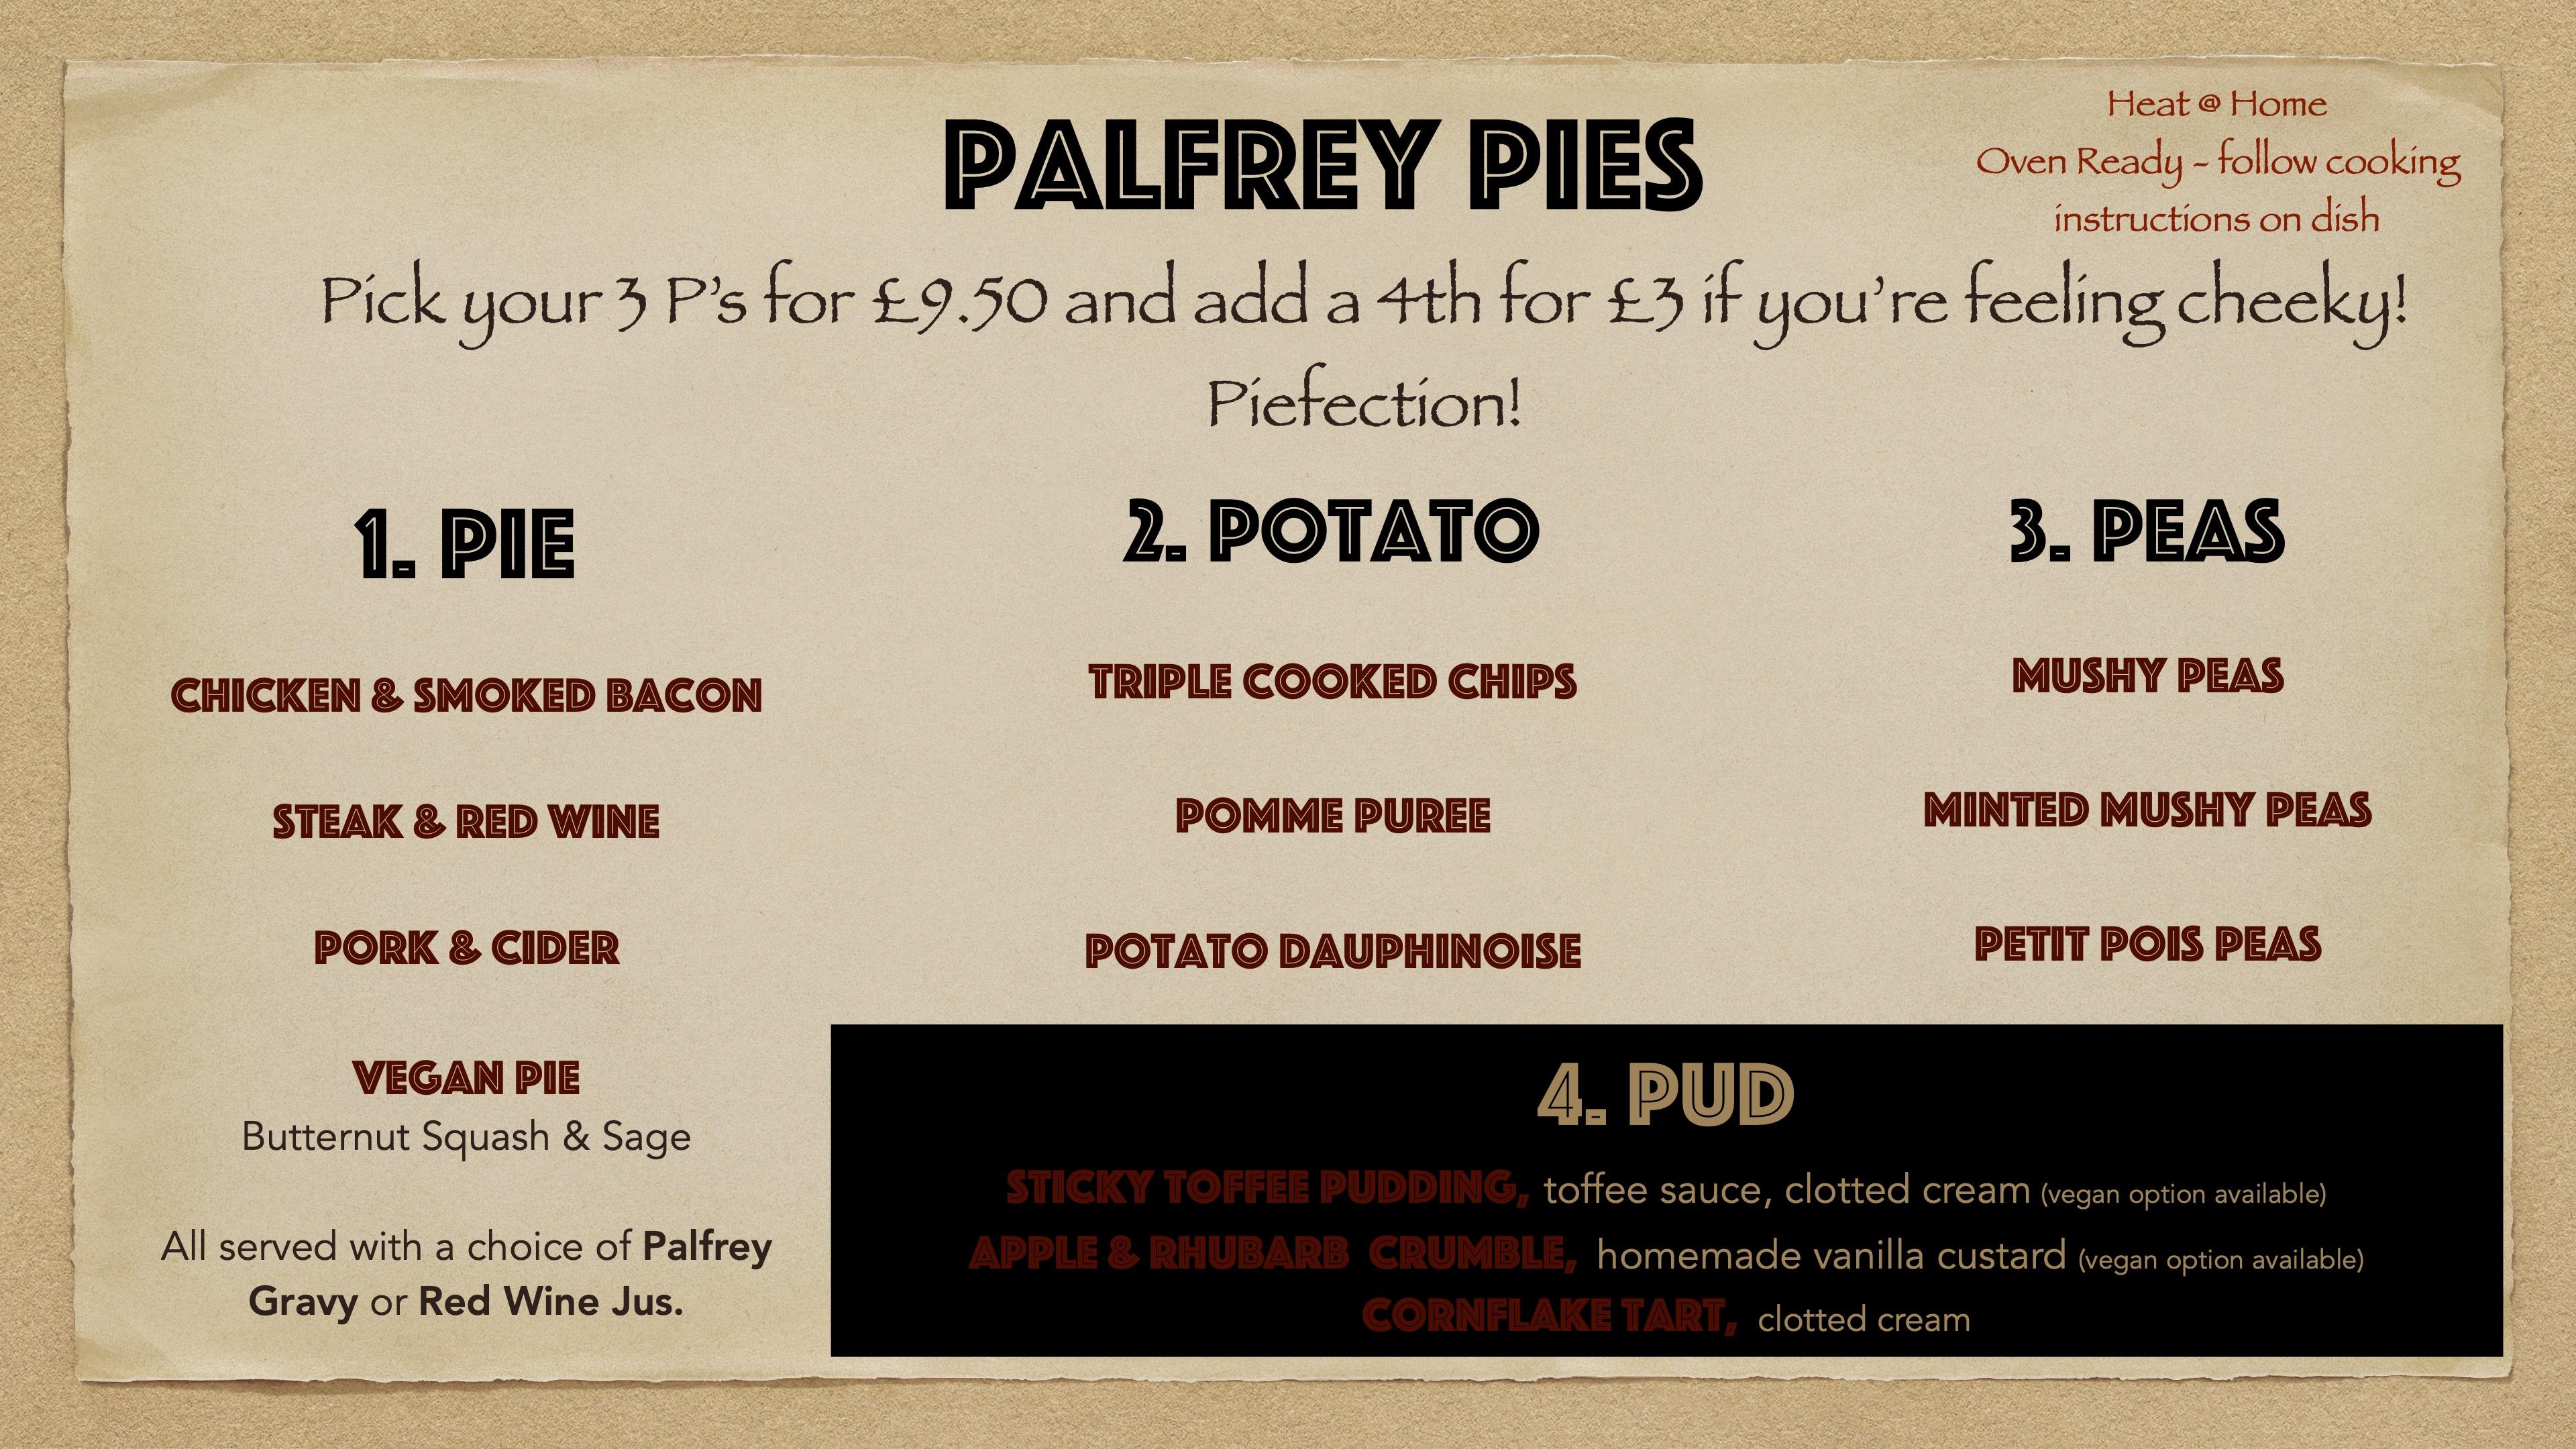 Palfrey Pies - 20th Jan